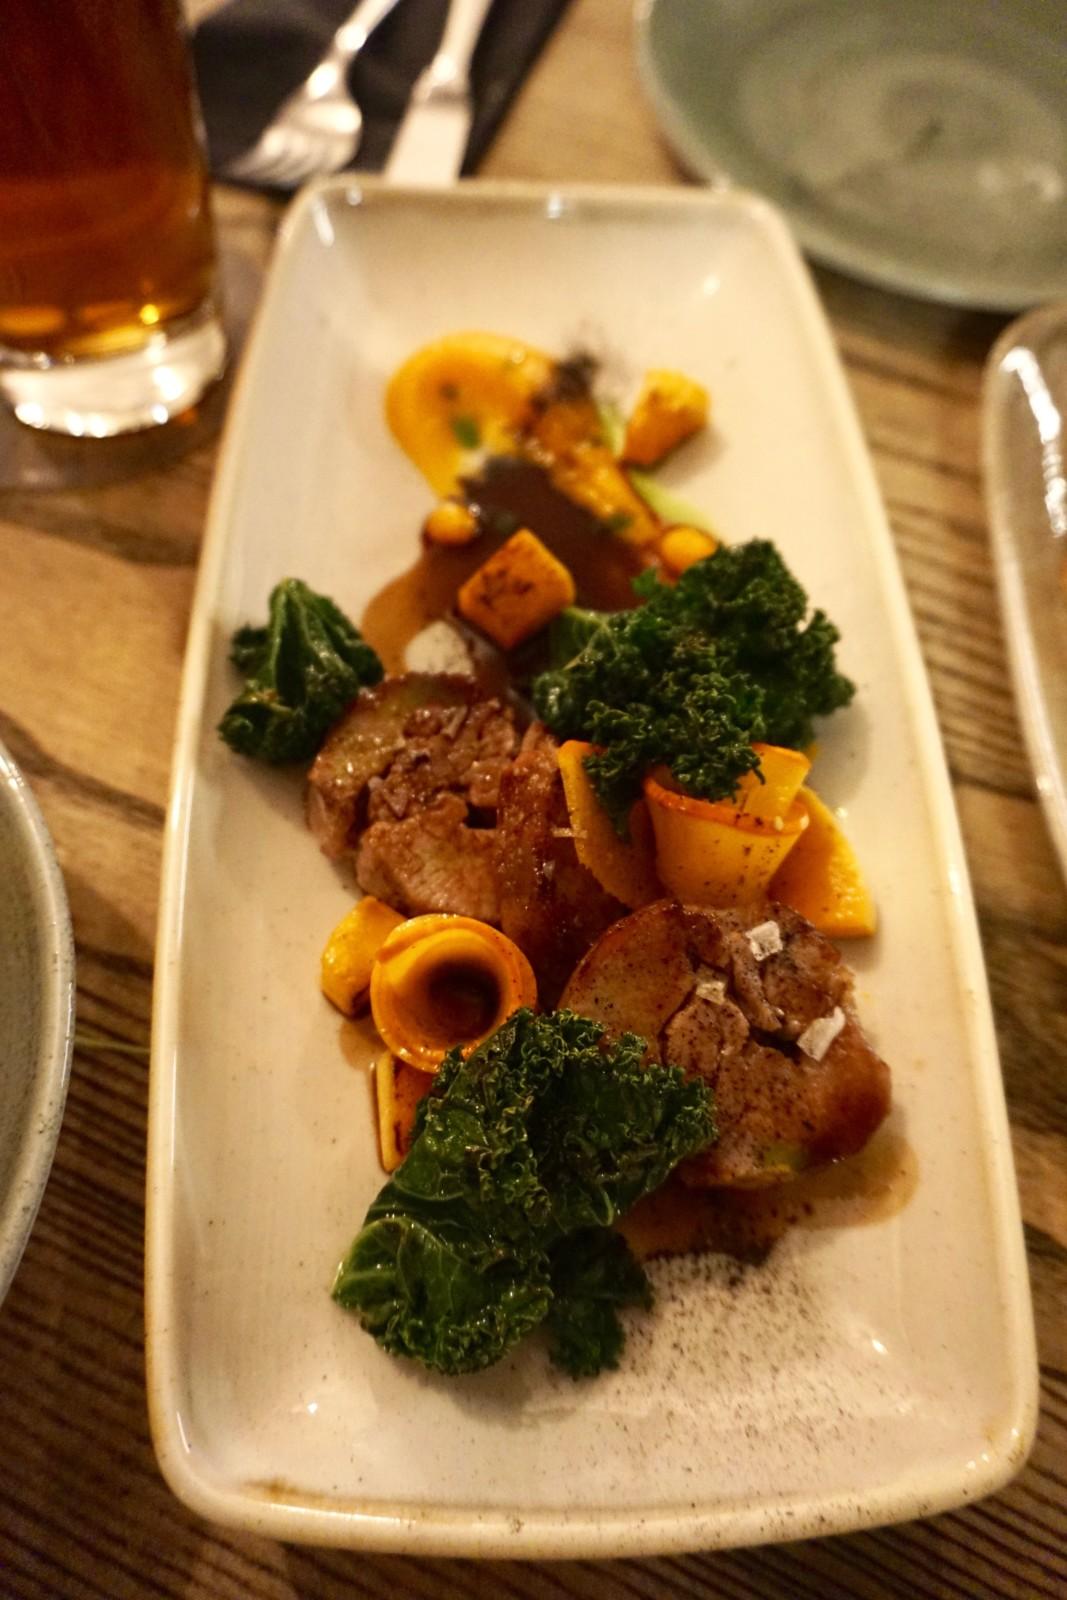 Gitzi – Kürbis – Federkohl. Drei Zutaten, ein tolles Hauptgericht. Foto: Lunchgate/Max